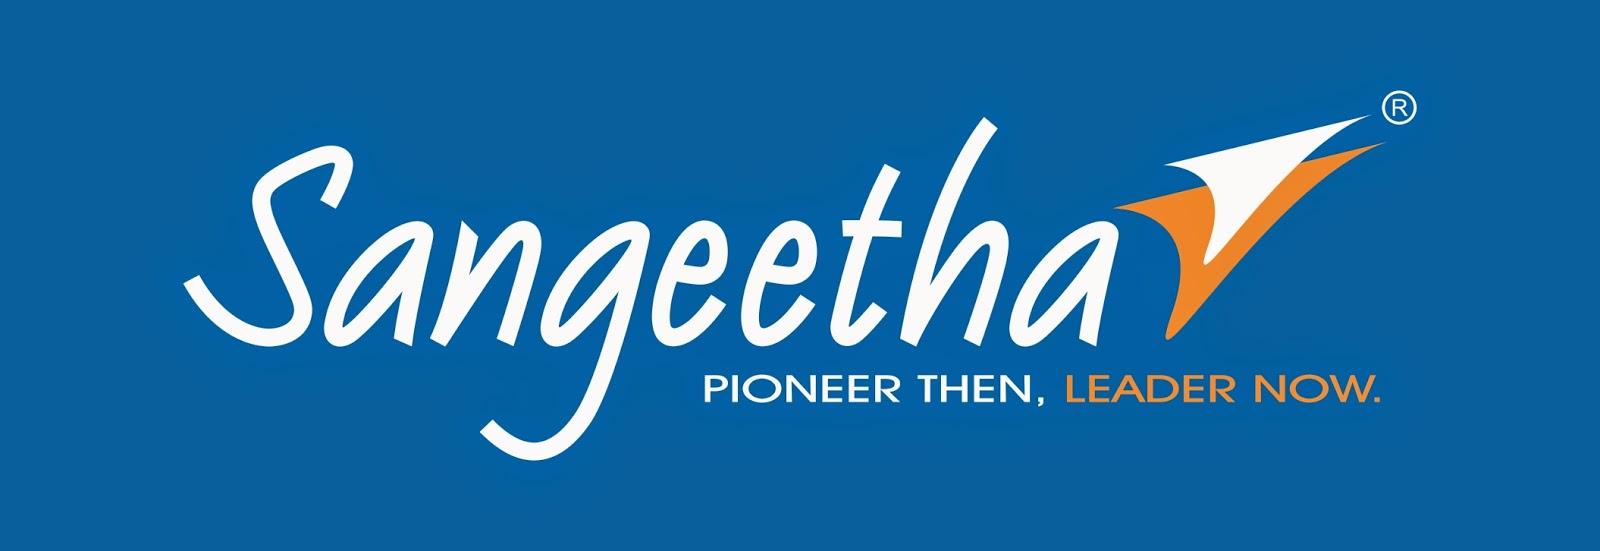 SANGEETHA MOBILES - BANGALORE Reviews, SANGEETHA MOBILES - BANGALORE ...